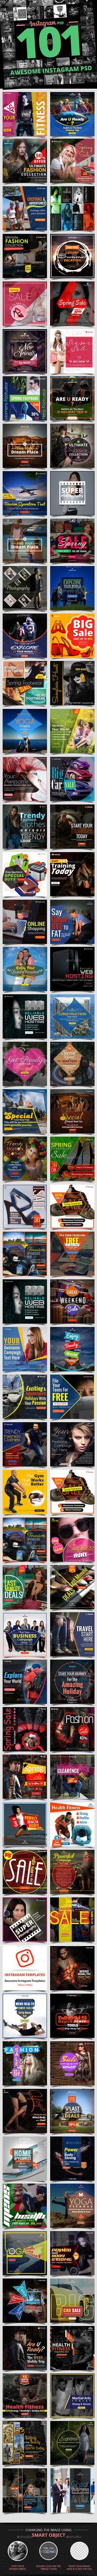 101 - Instagram Banners Templates PSD. Download here: https://graphicriver.net/item/101-instagram-banners/17253849?ref=ksioks